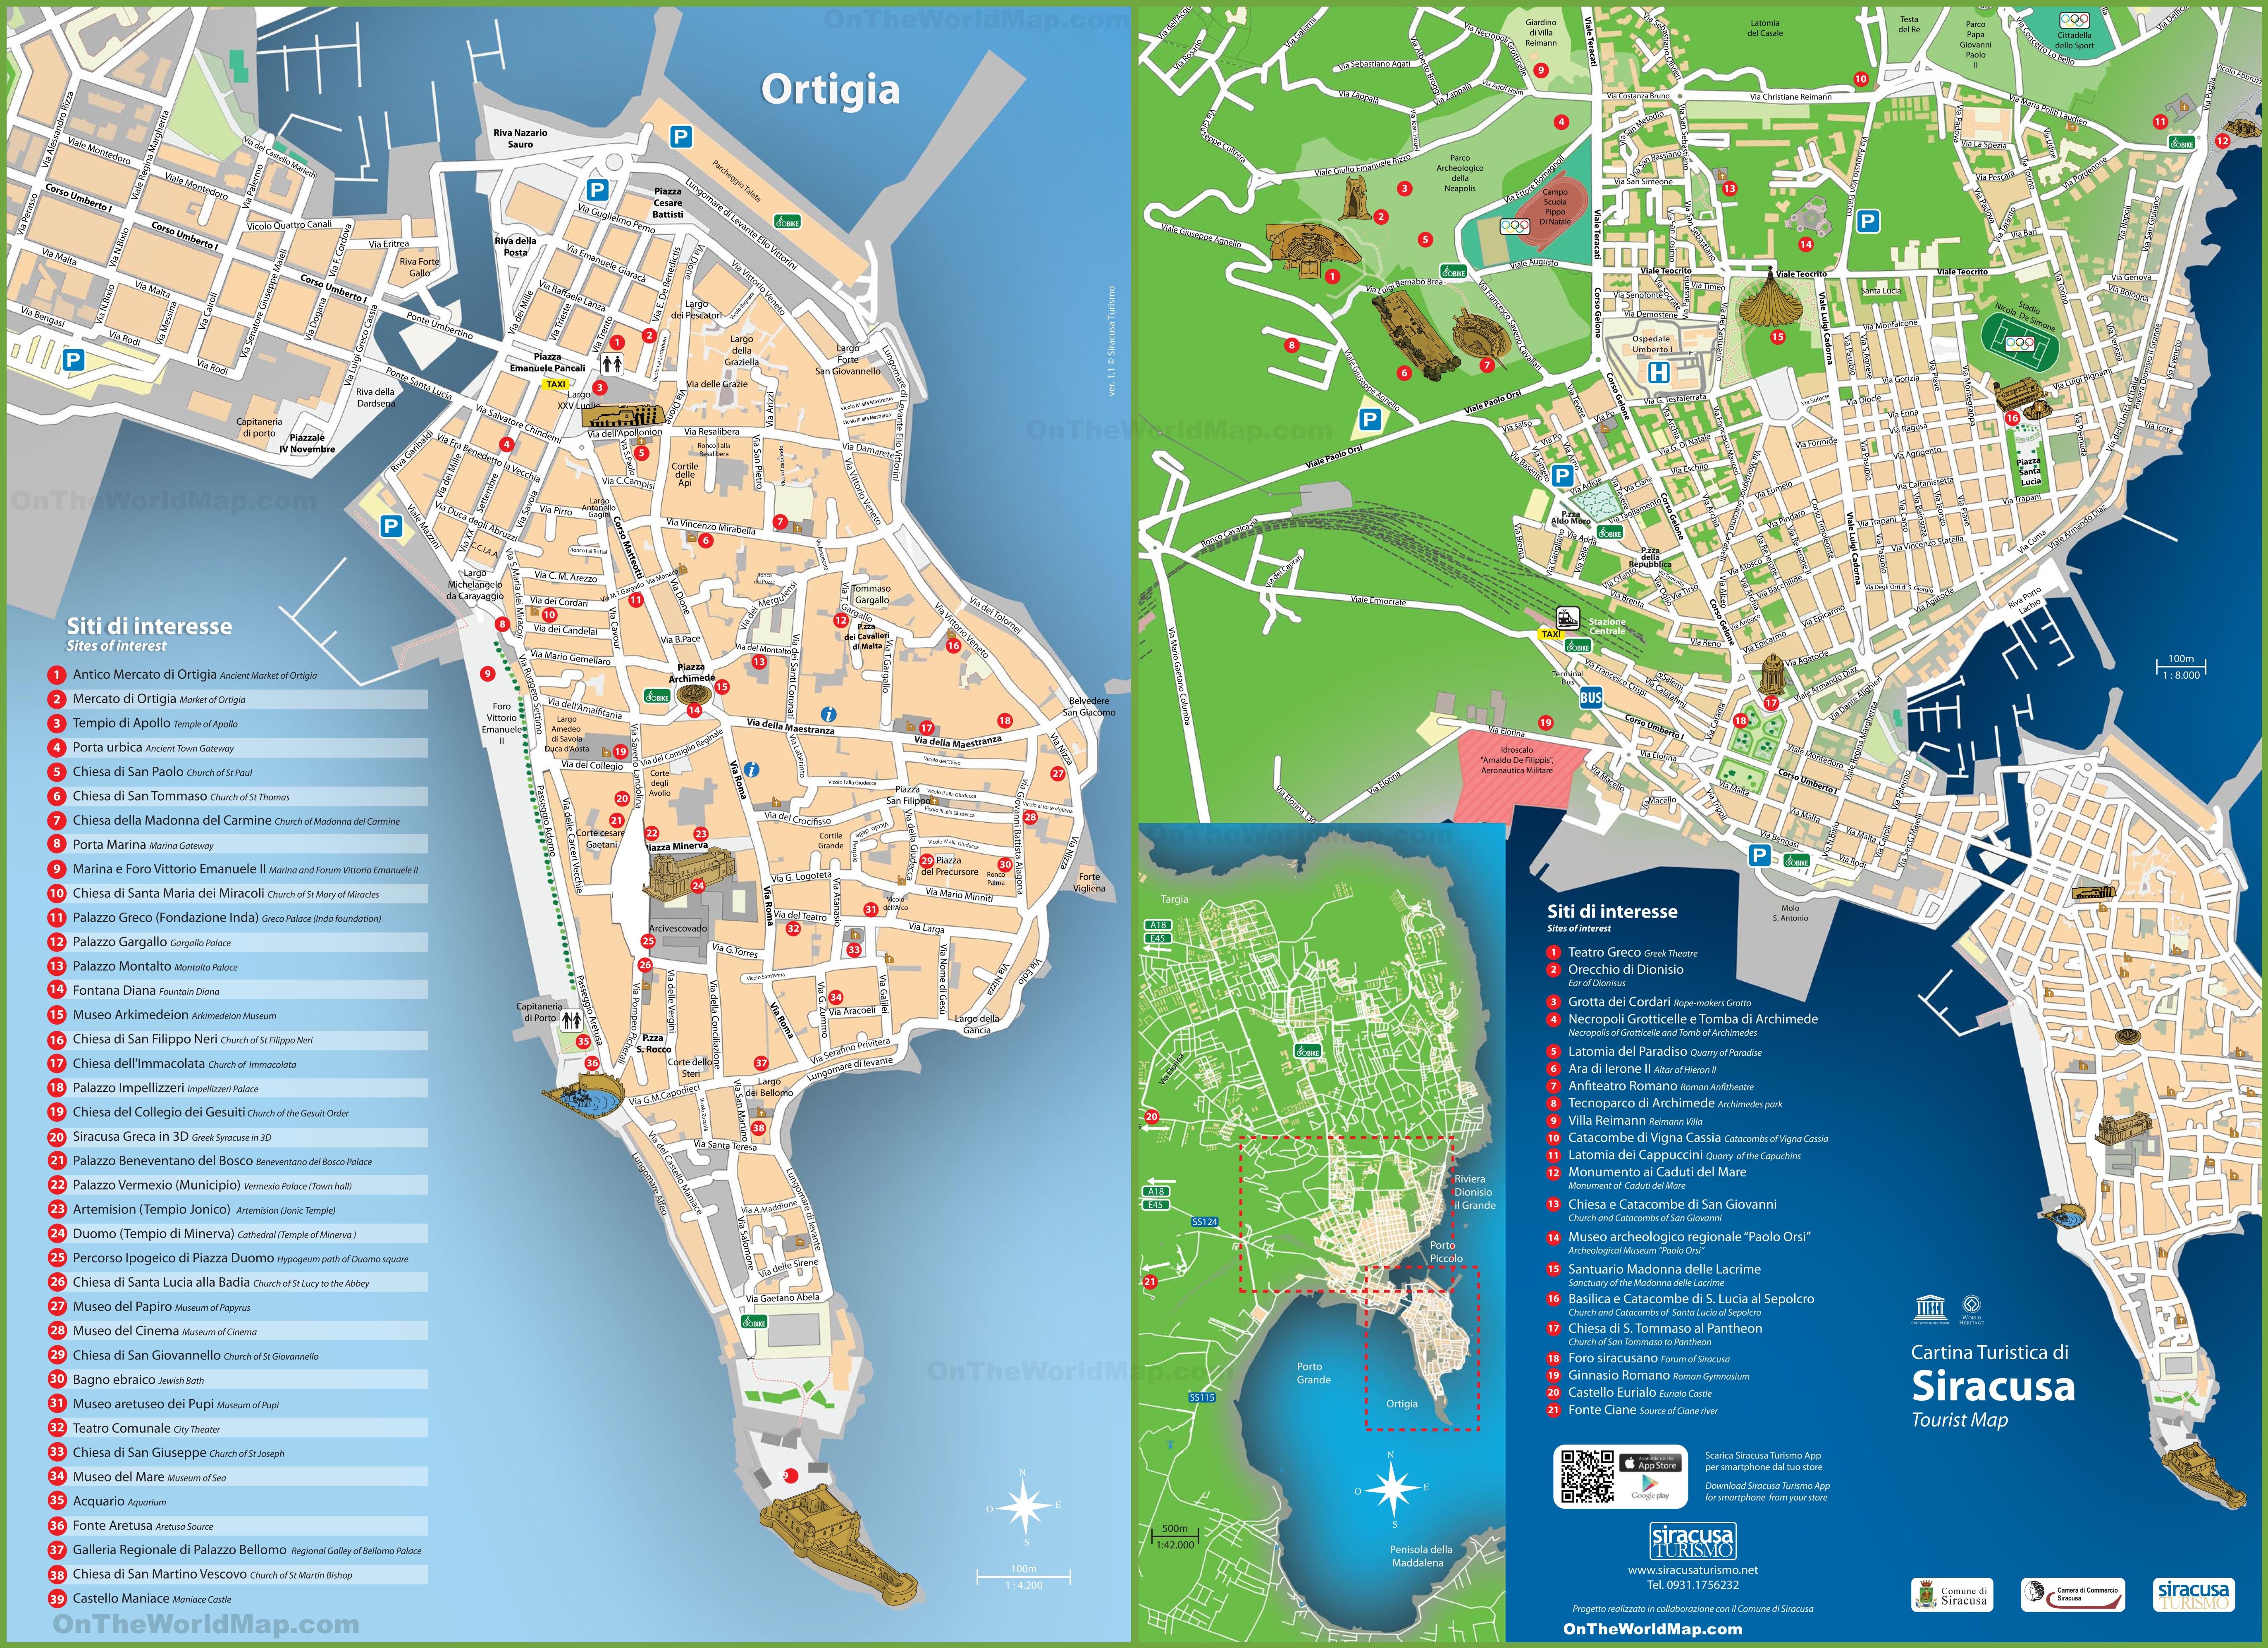 Syracuse Maps Sicily Italy Maps Of Syracuse Siracusa - Syracuse map italy